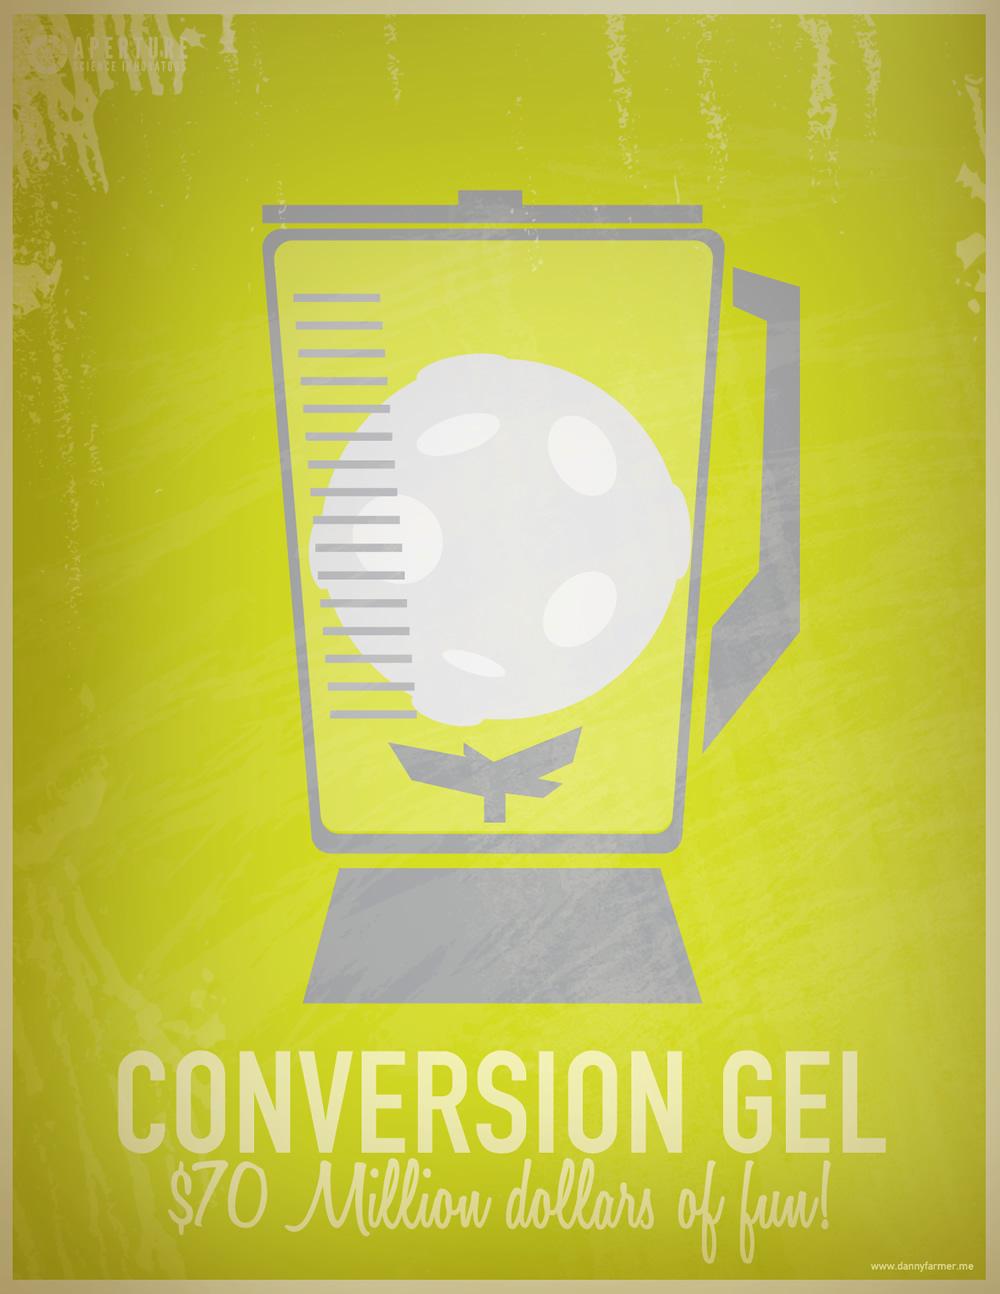 Conversion Gel $70 million dollars of fun